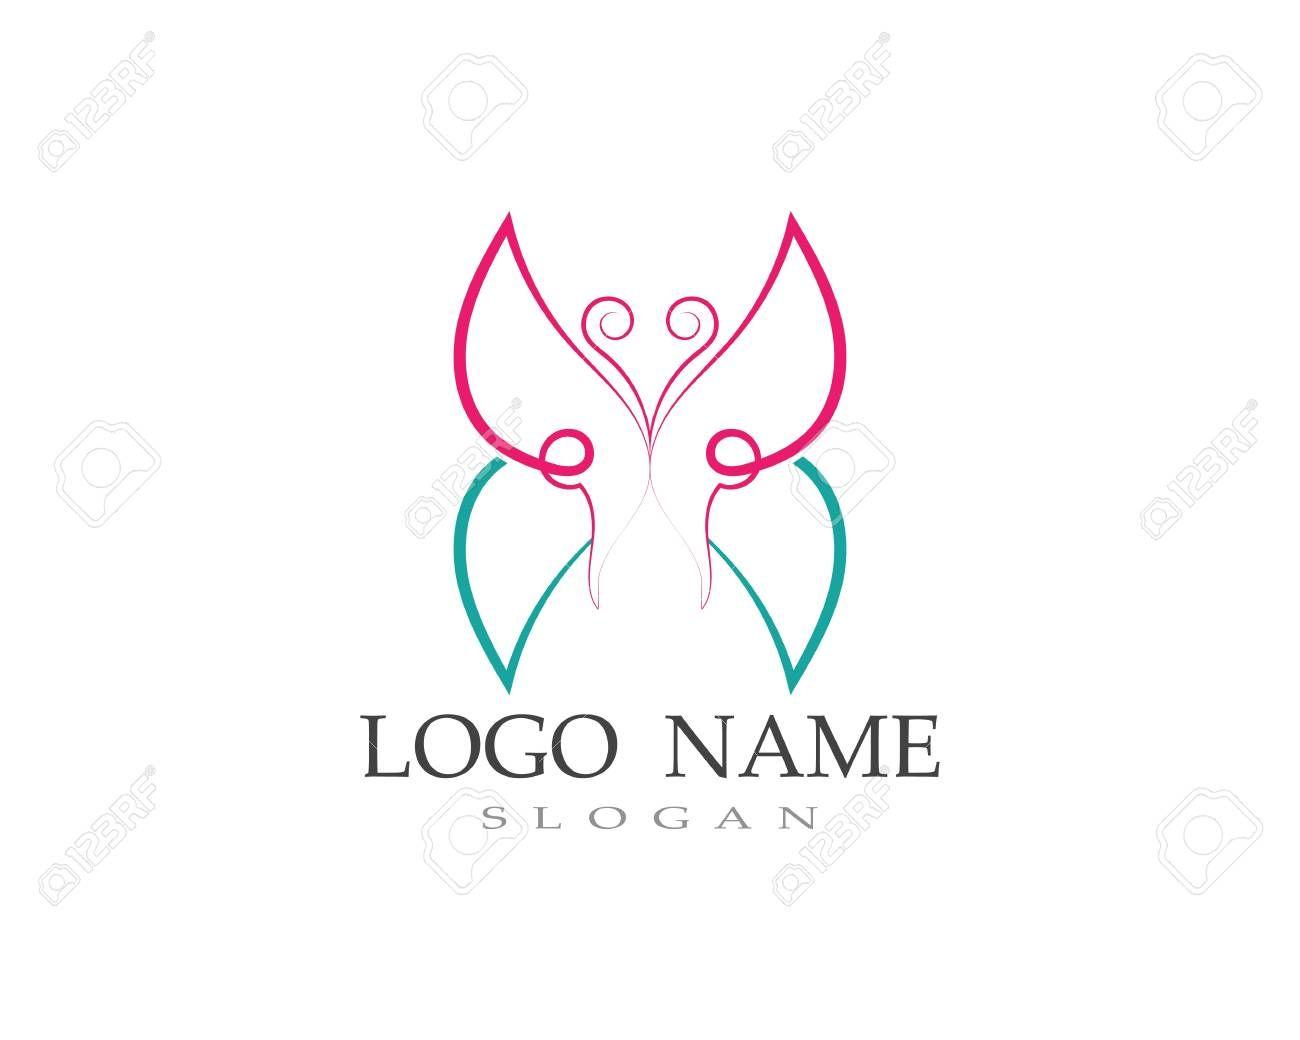 Butterfly Logo And Symbol Vector Design Sponsored Logo Butterfly Symbol Design Vector Butterfly Logo Vector Design Template Free